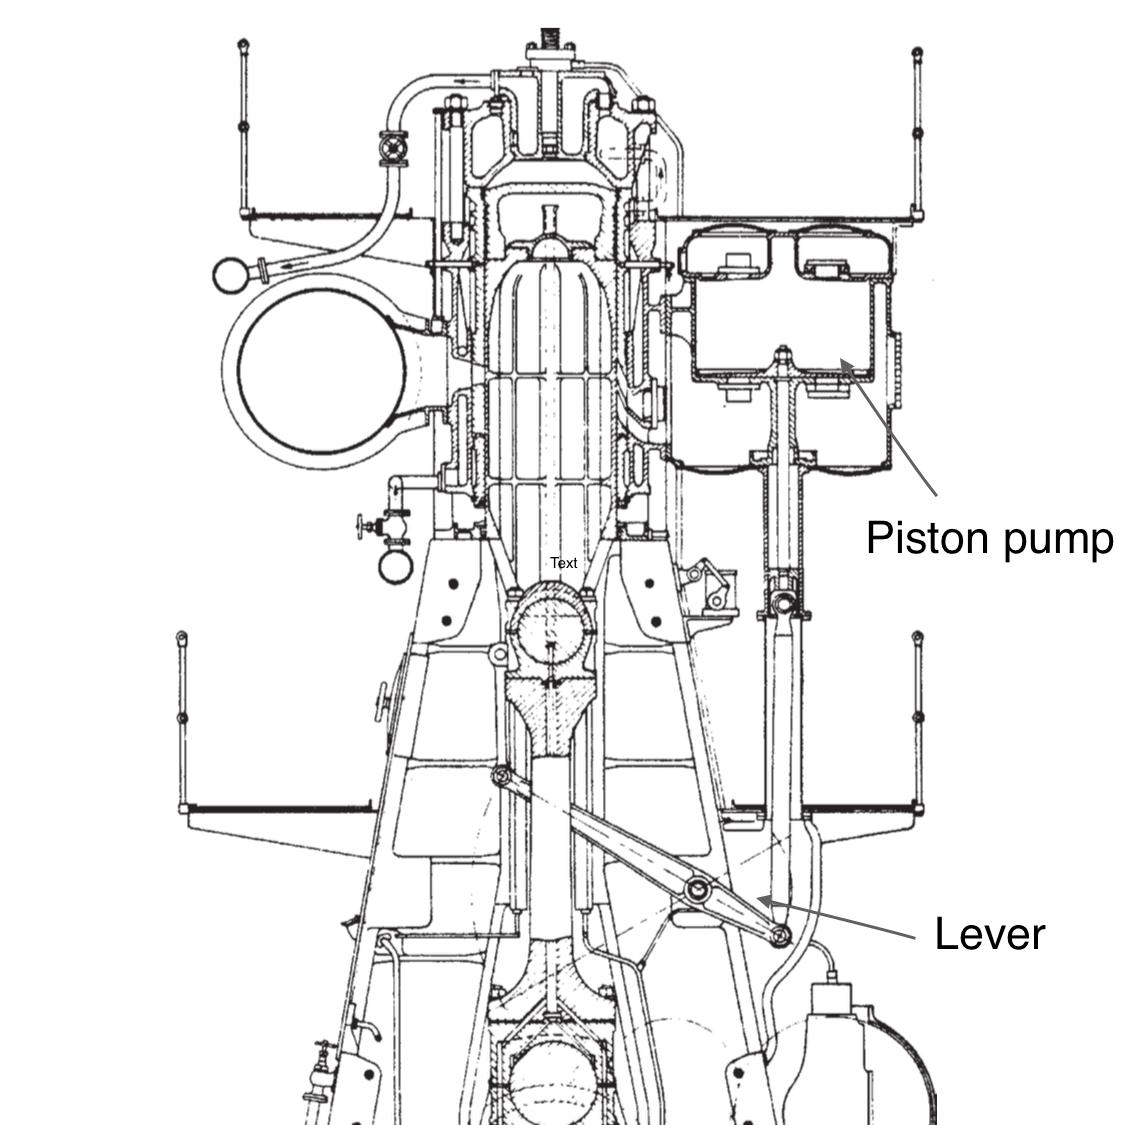 Lever Pump